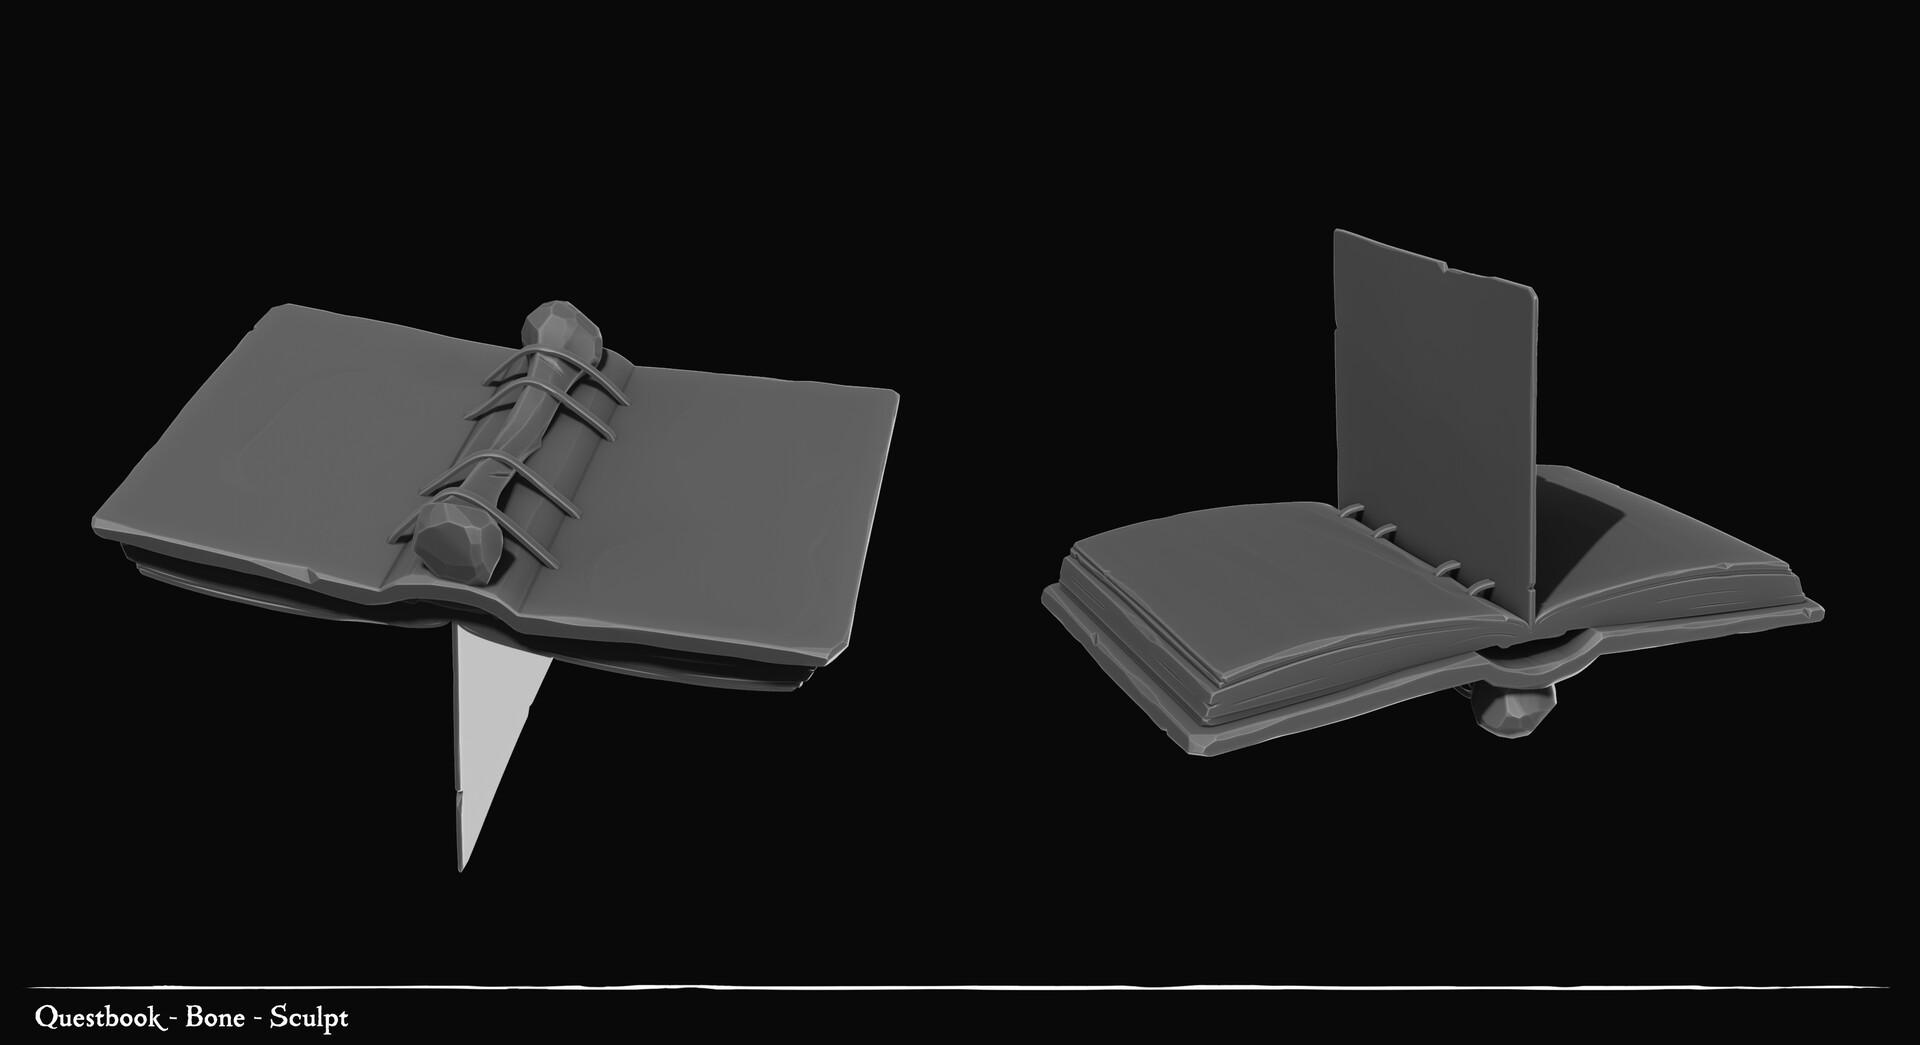 george-o-keeffe-10-sot-questbook-bone-sculpt.jpg